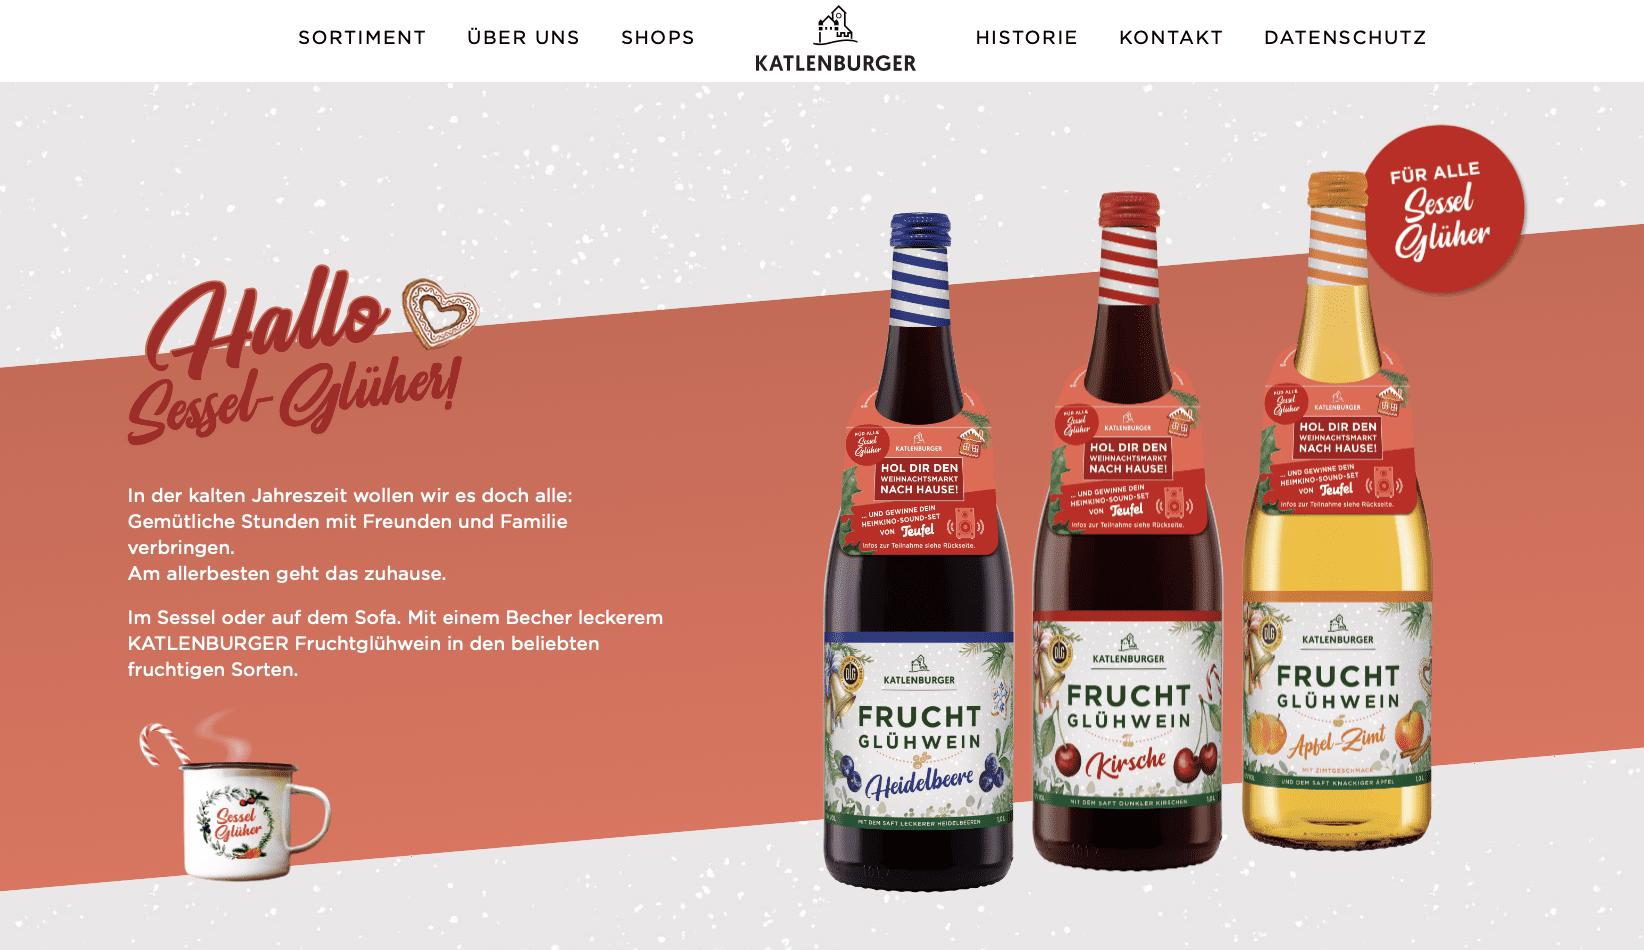 Gewinnspiel-Cases FMCG Getränke